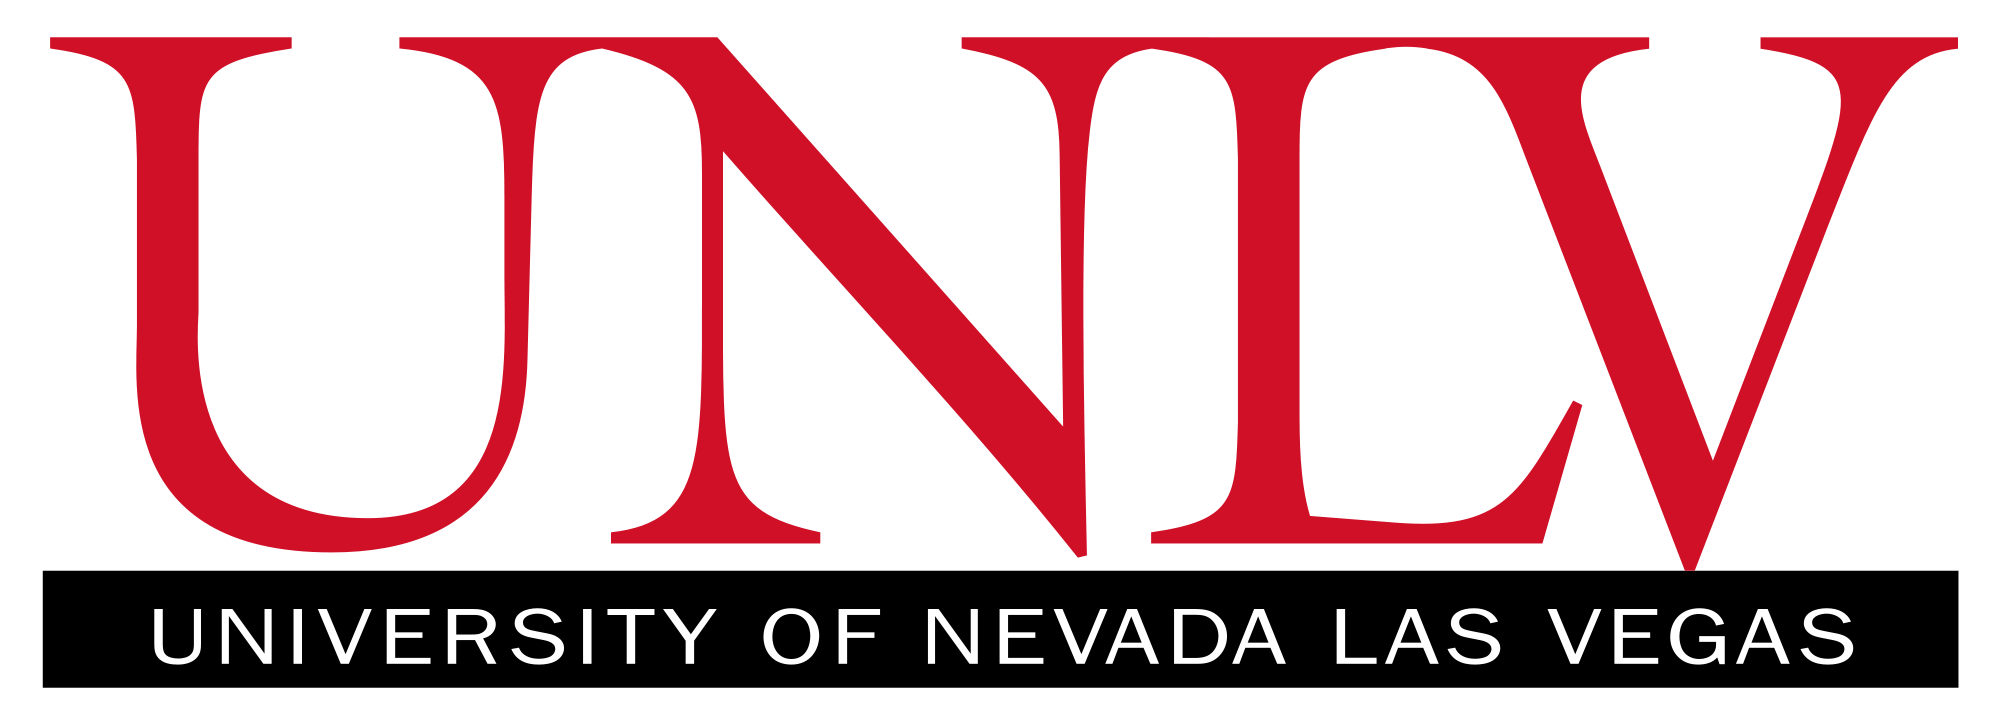 Http Www Unlv Edu Las Vegas Schools Business School Unlv